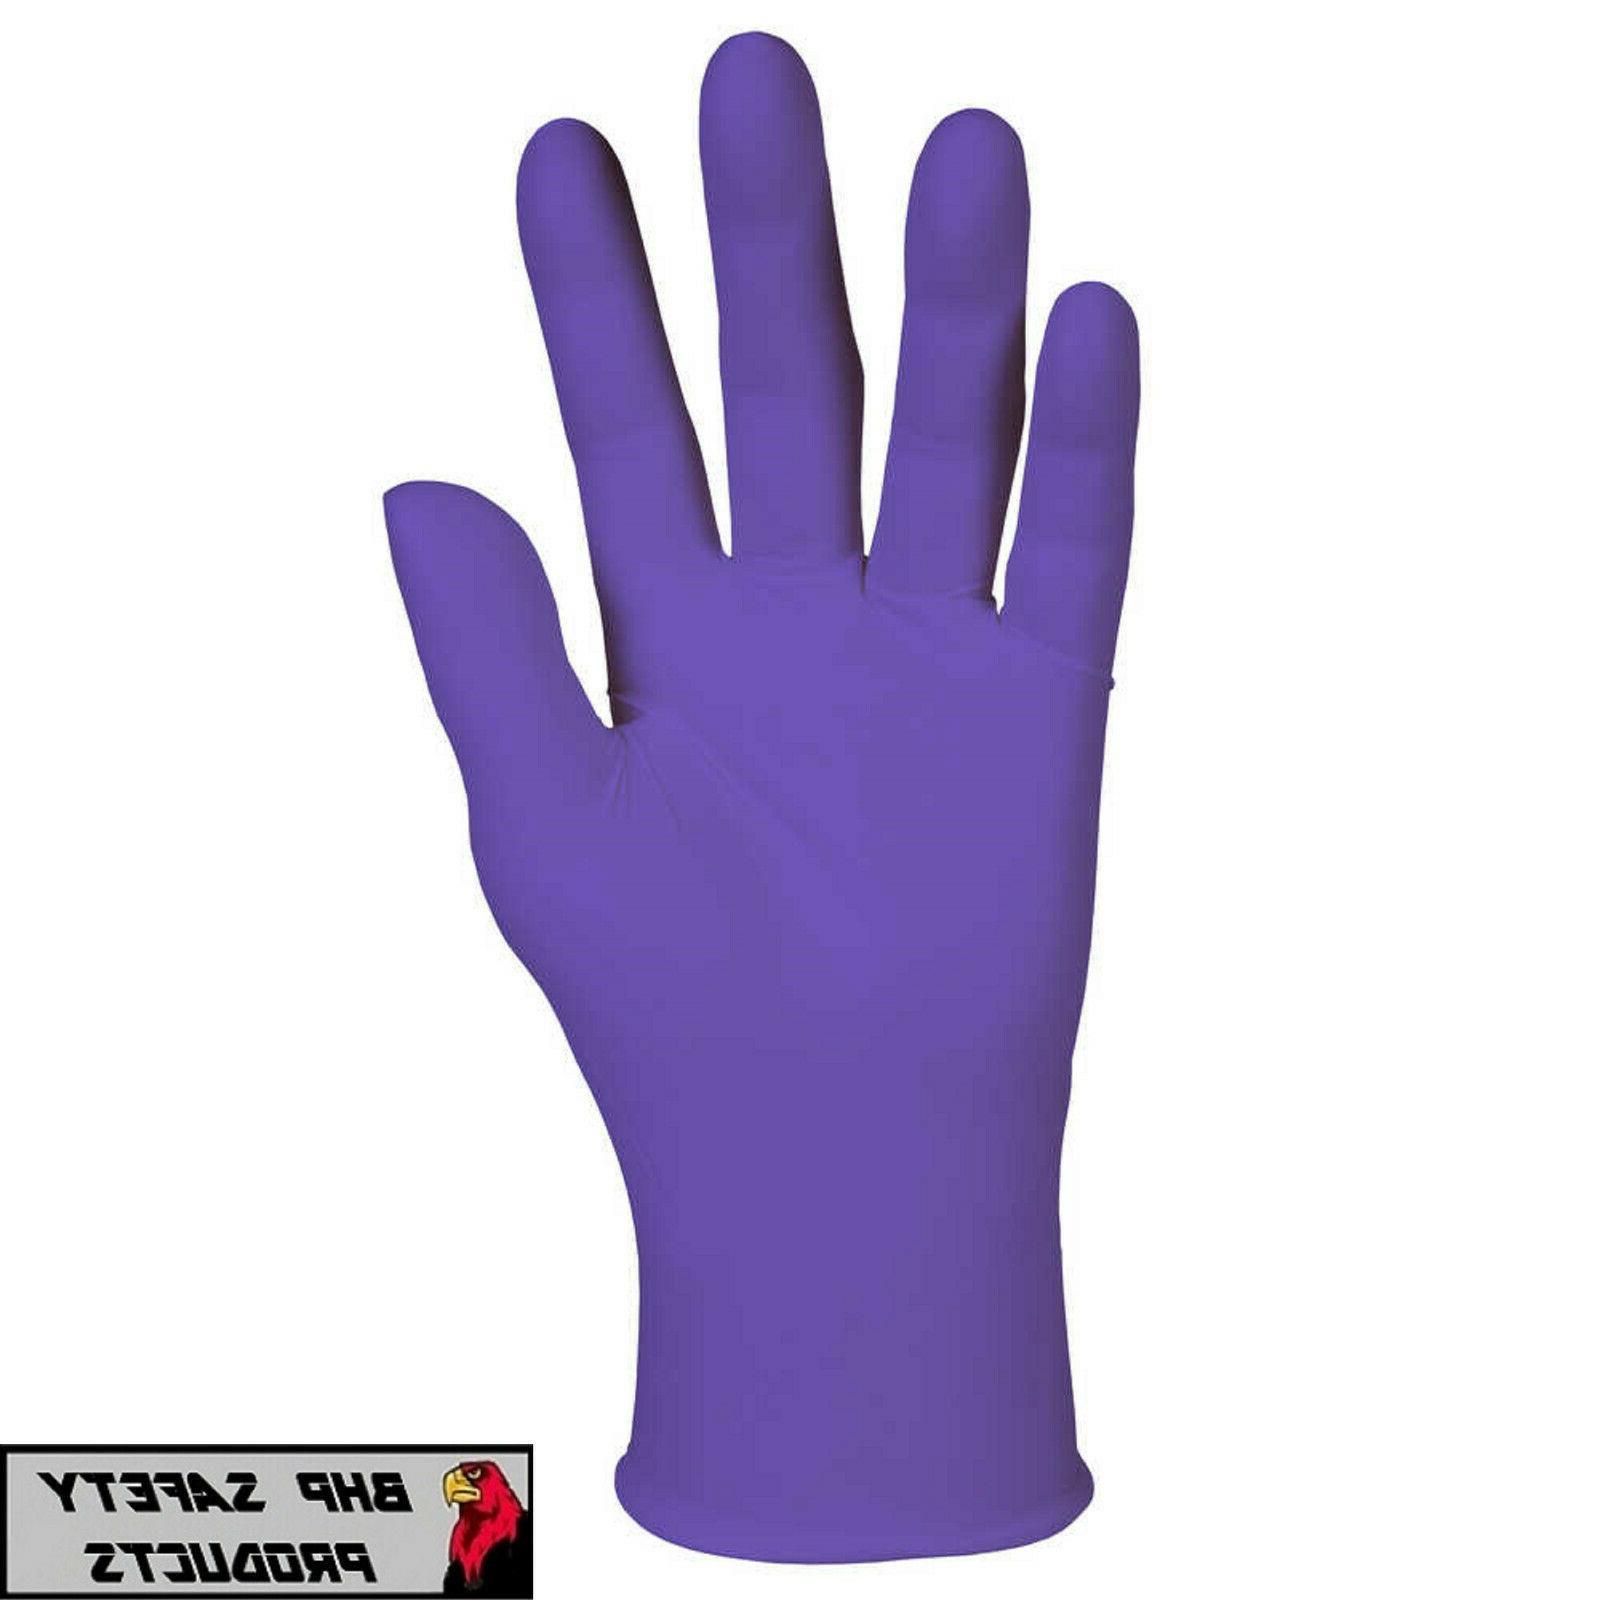 kimberly clark kc500 purple nitrile exam powder